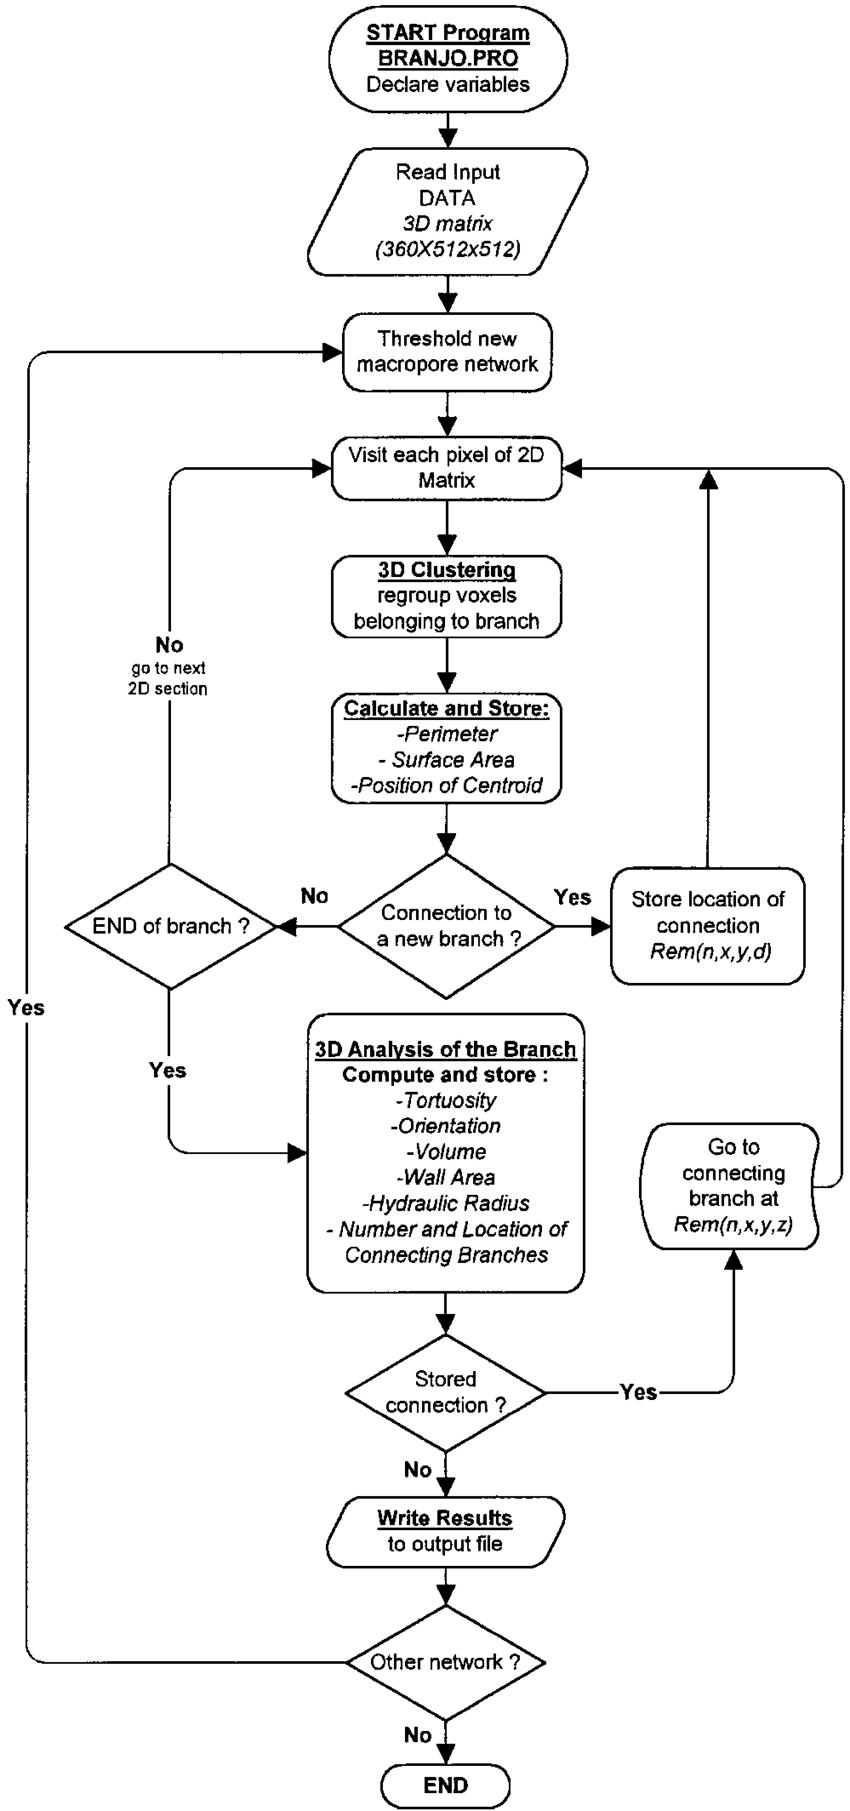 medium resolution of flow diagram of the pv wave program branjo pro